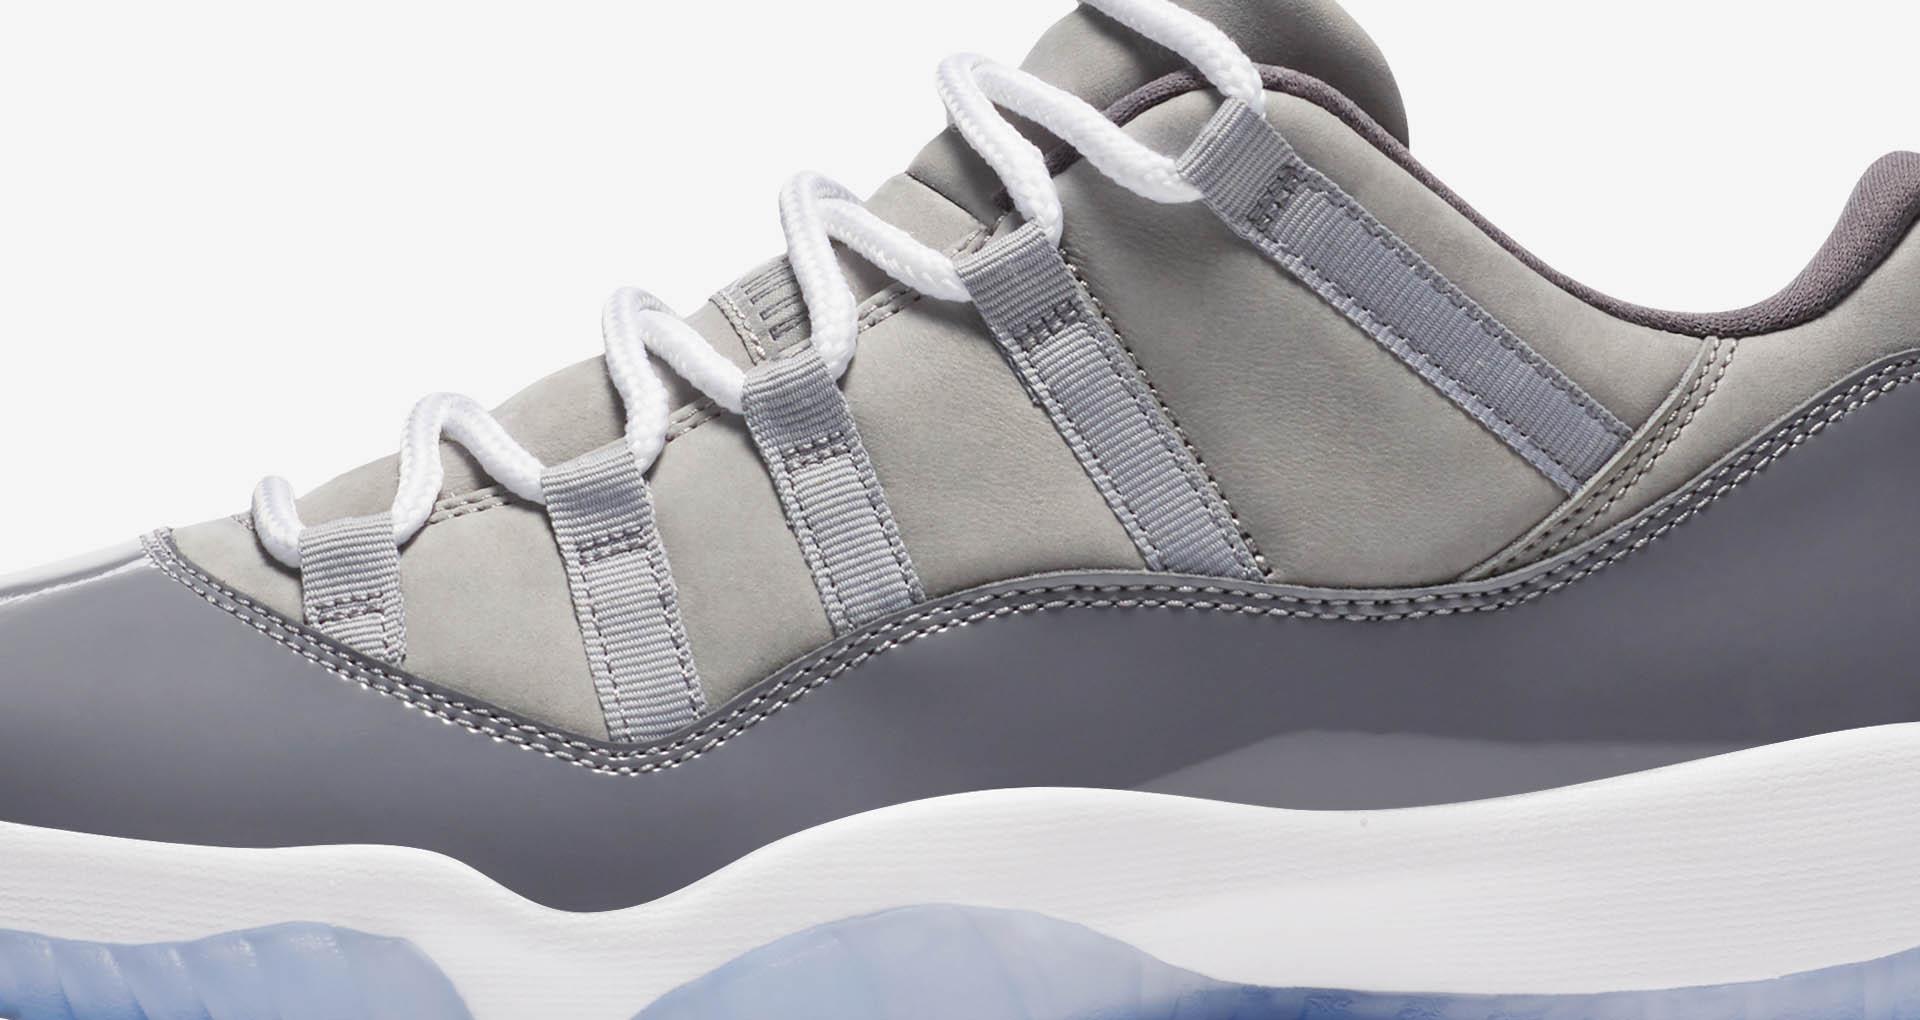 detailed look df0e9 c9f9a Air Jordan 11 Low Cool Grey 2018 - Sneaker Match Tees